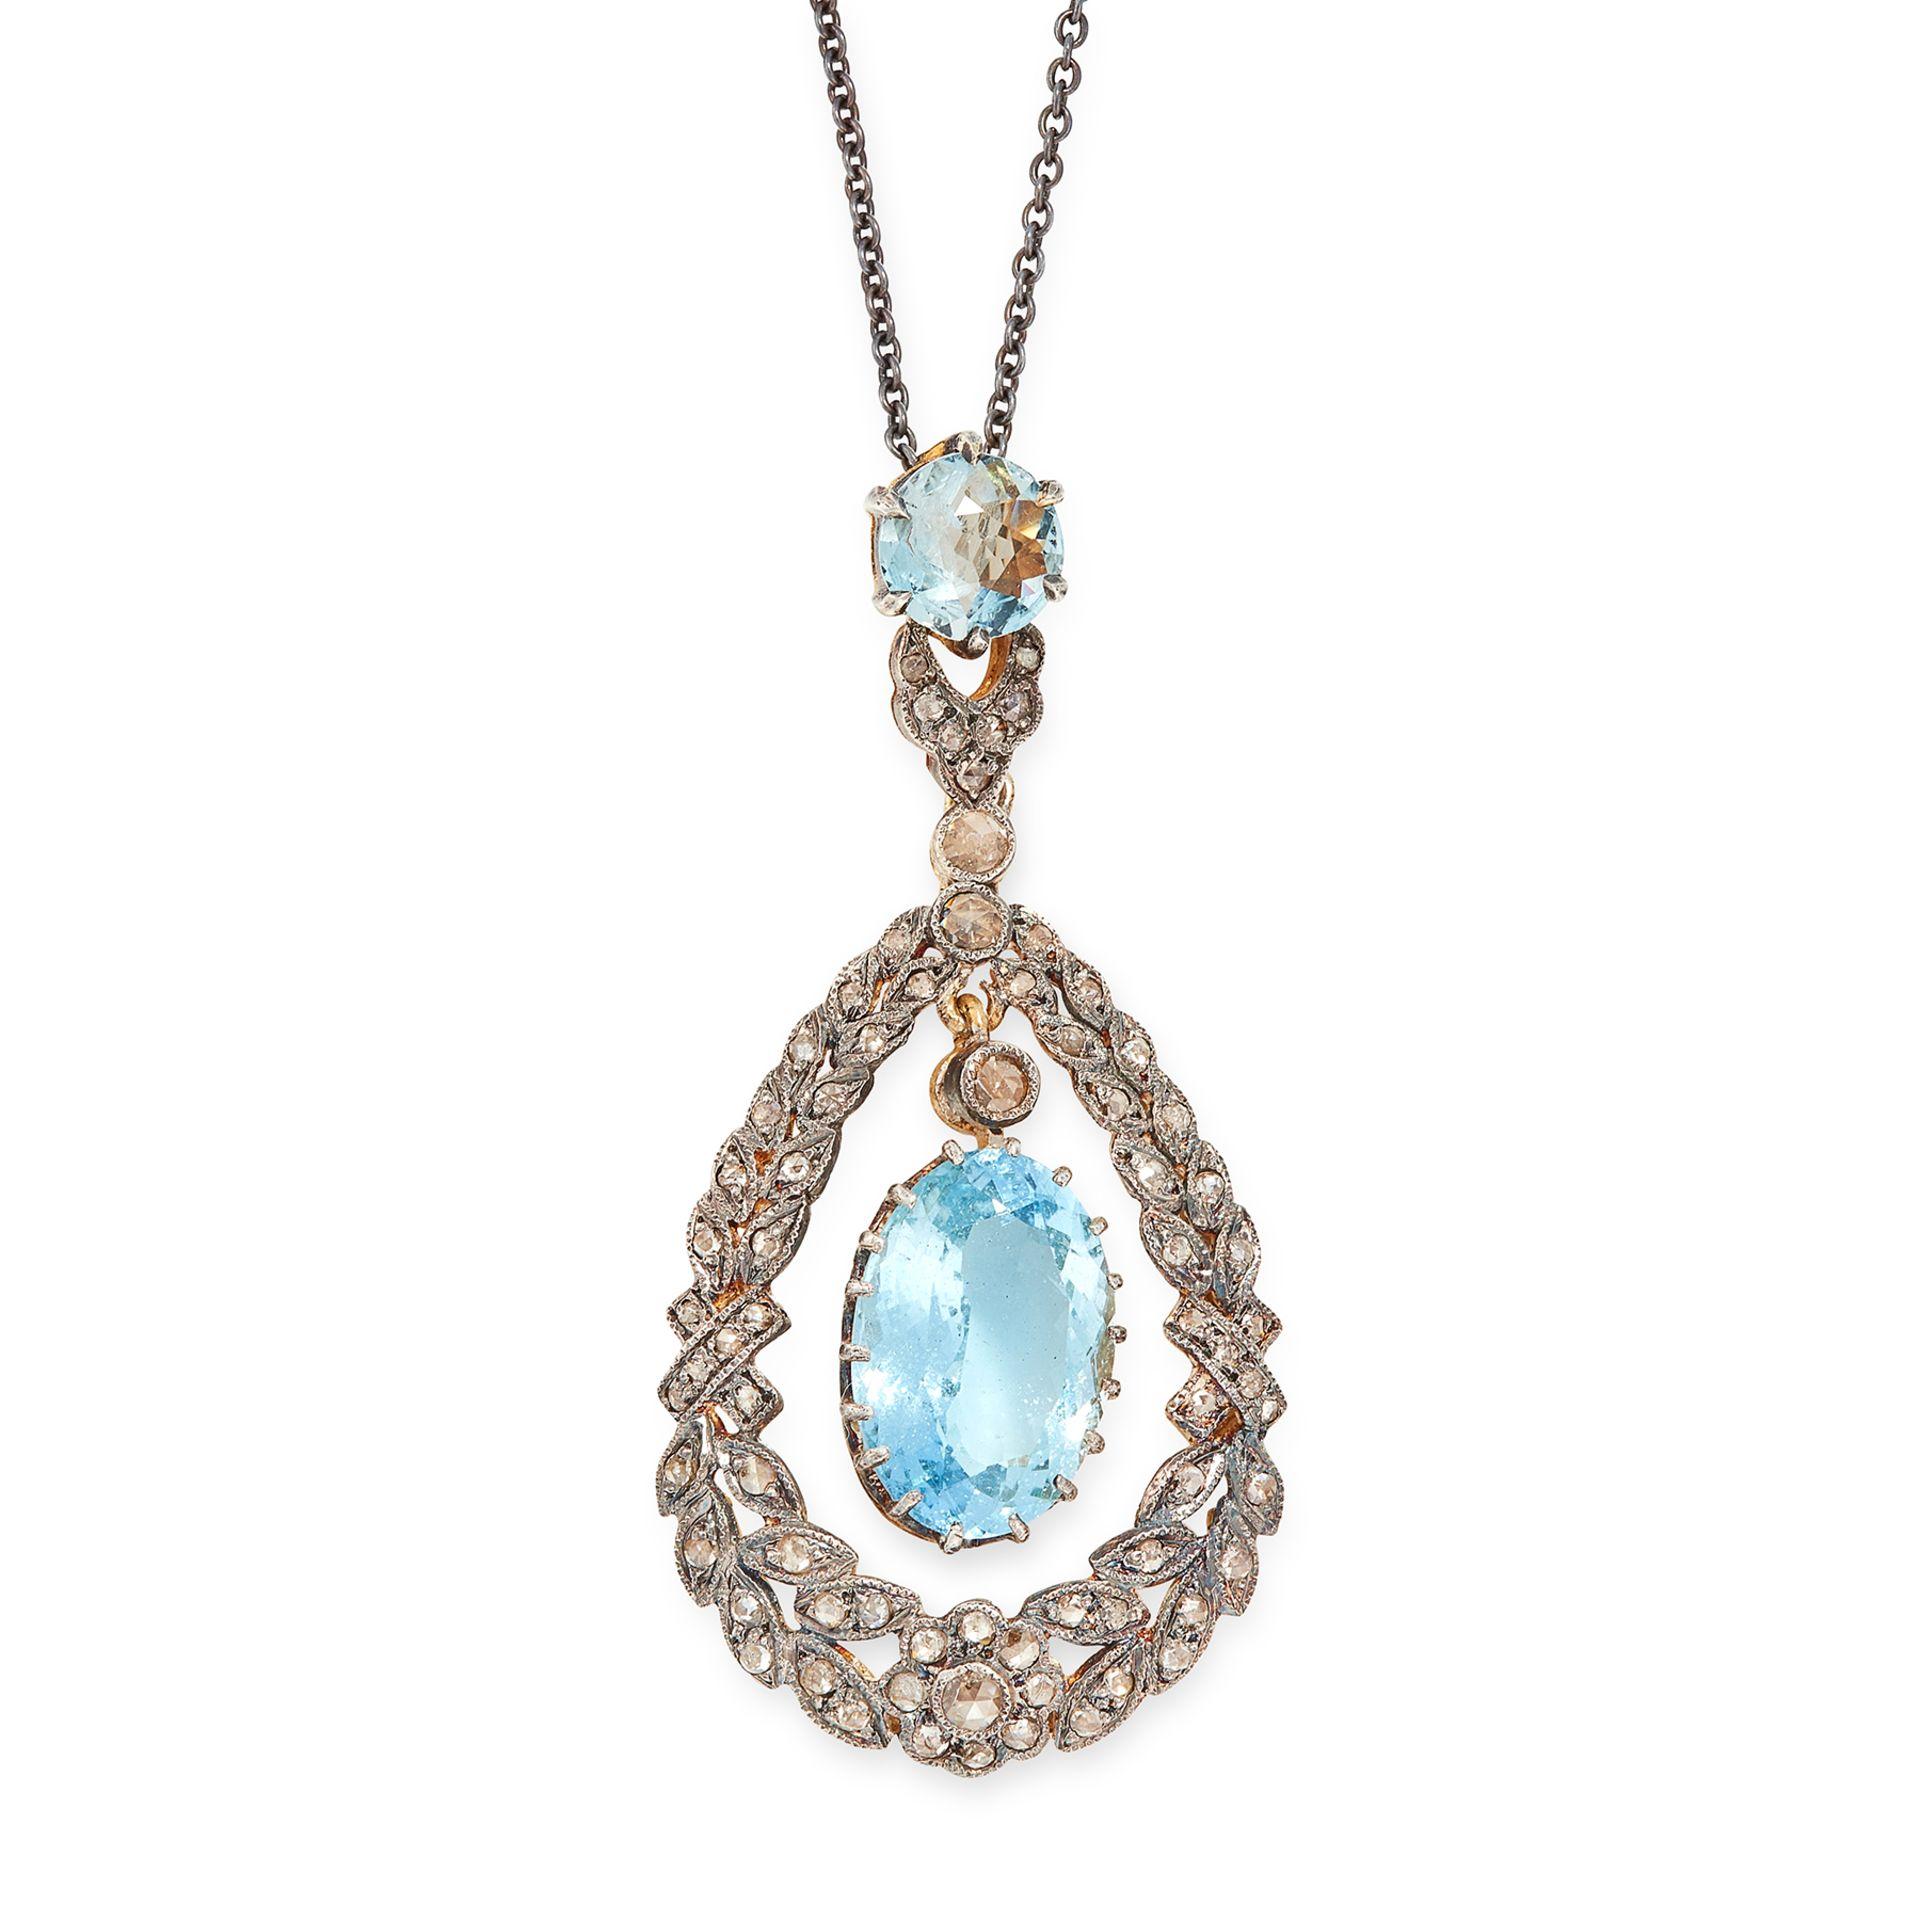 AN AQUAMARINE AND DIAMOND PENDANT AND CHAIN the pendant set with a principal oval cut aquamarine